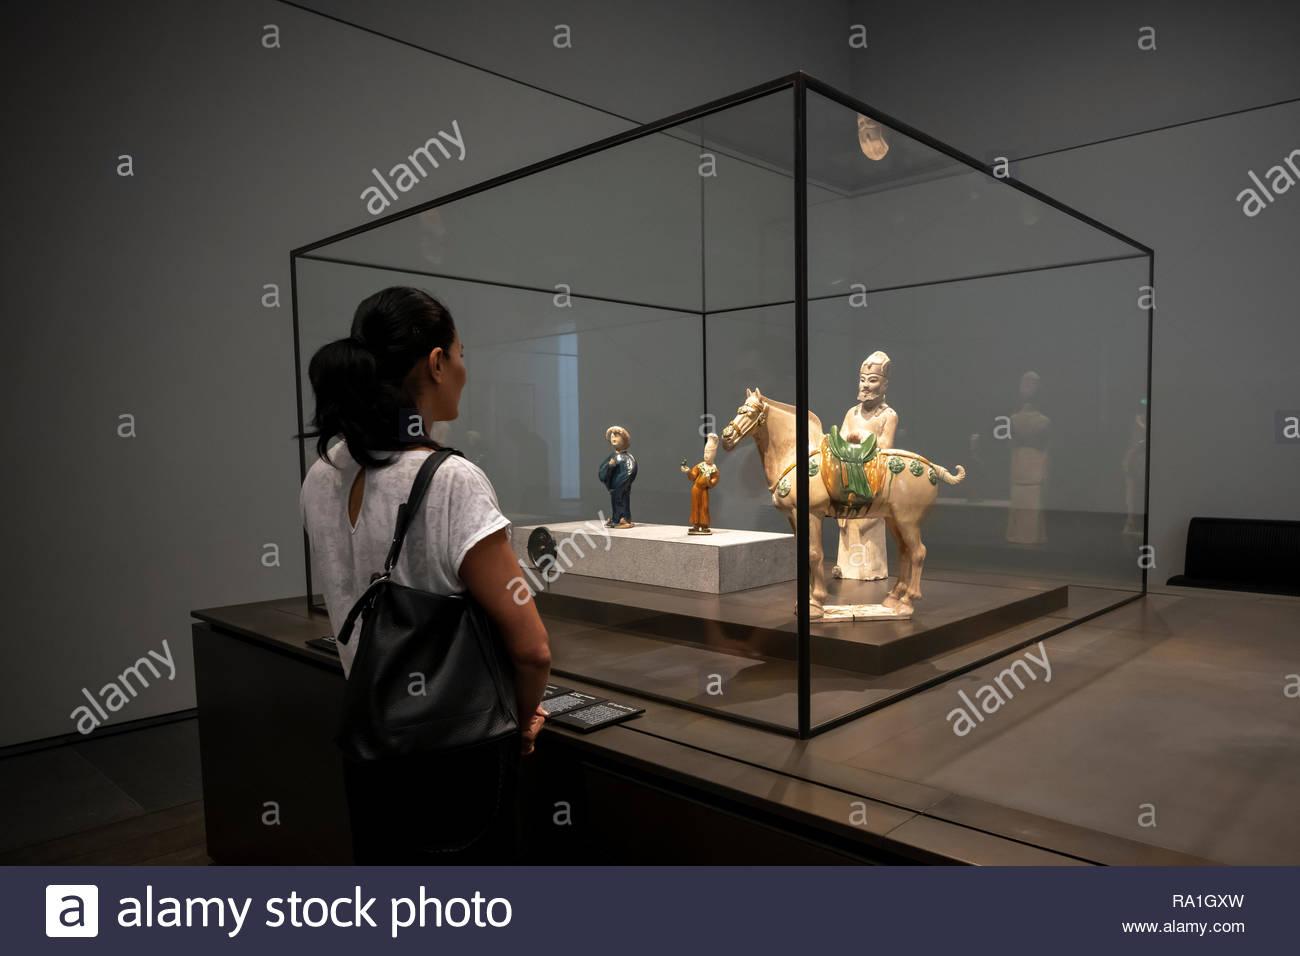 Abu Dhabi, UAE  30th Dec 2018  Tourist looking at statuettes